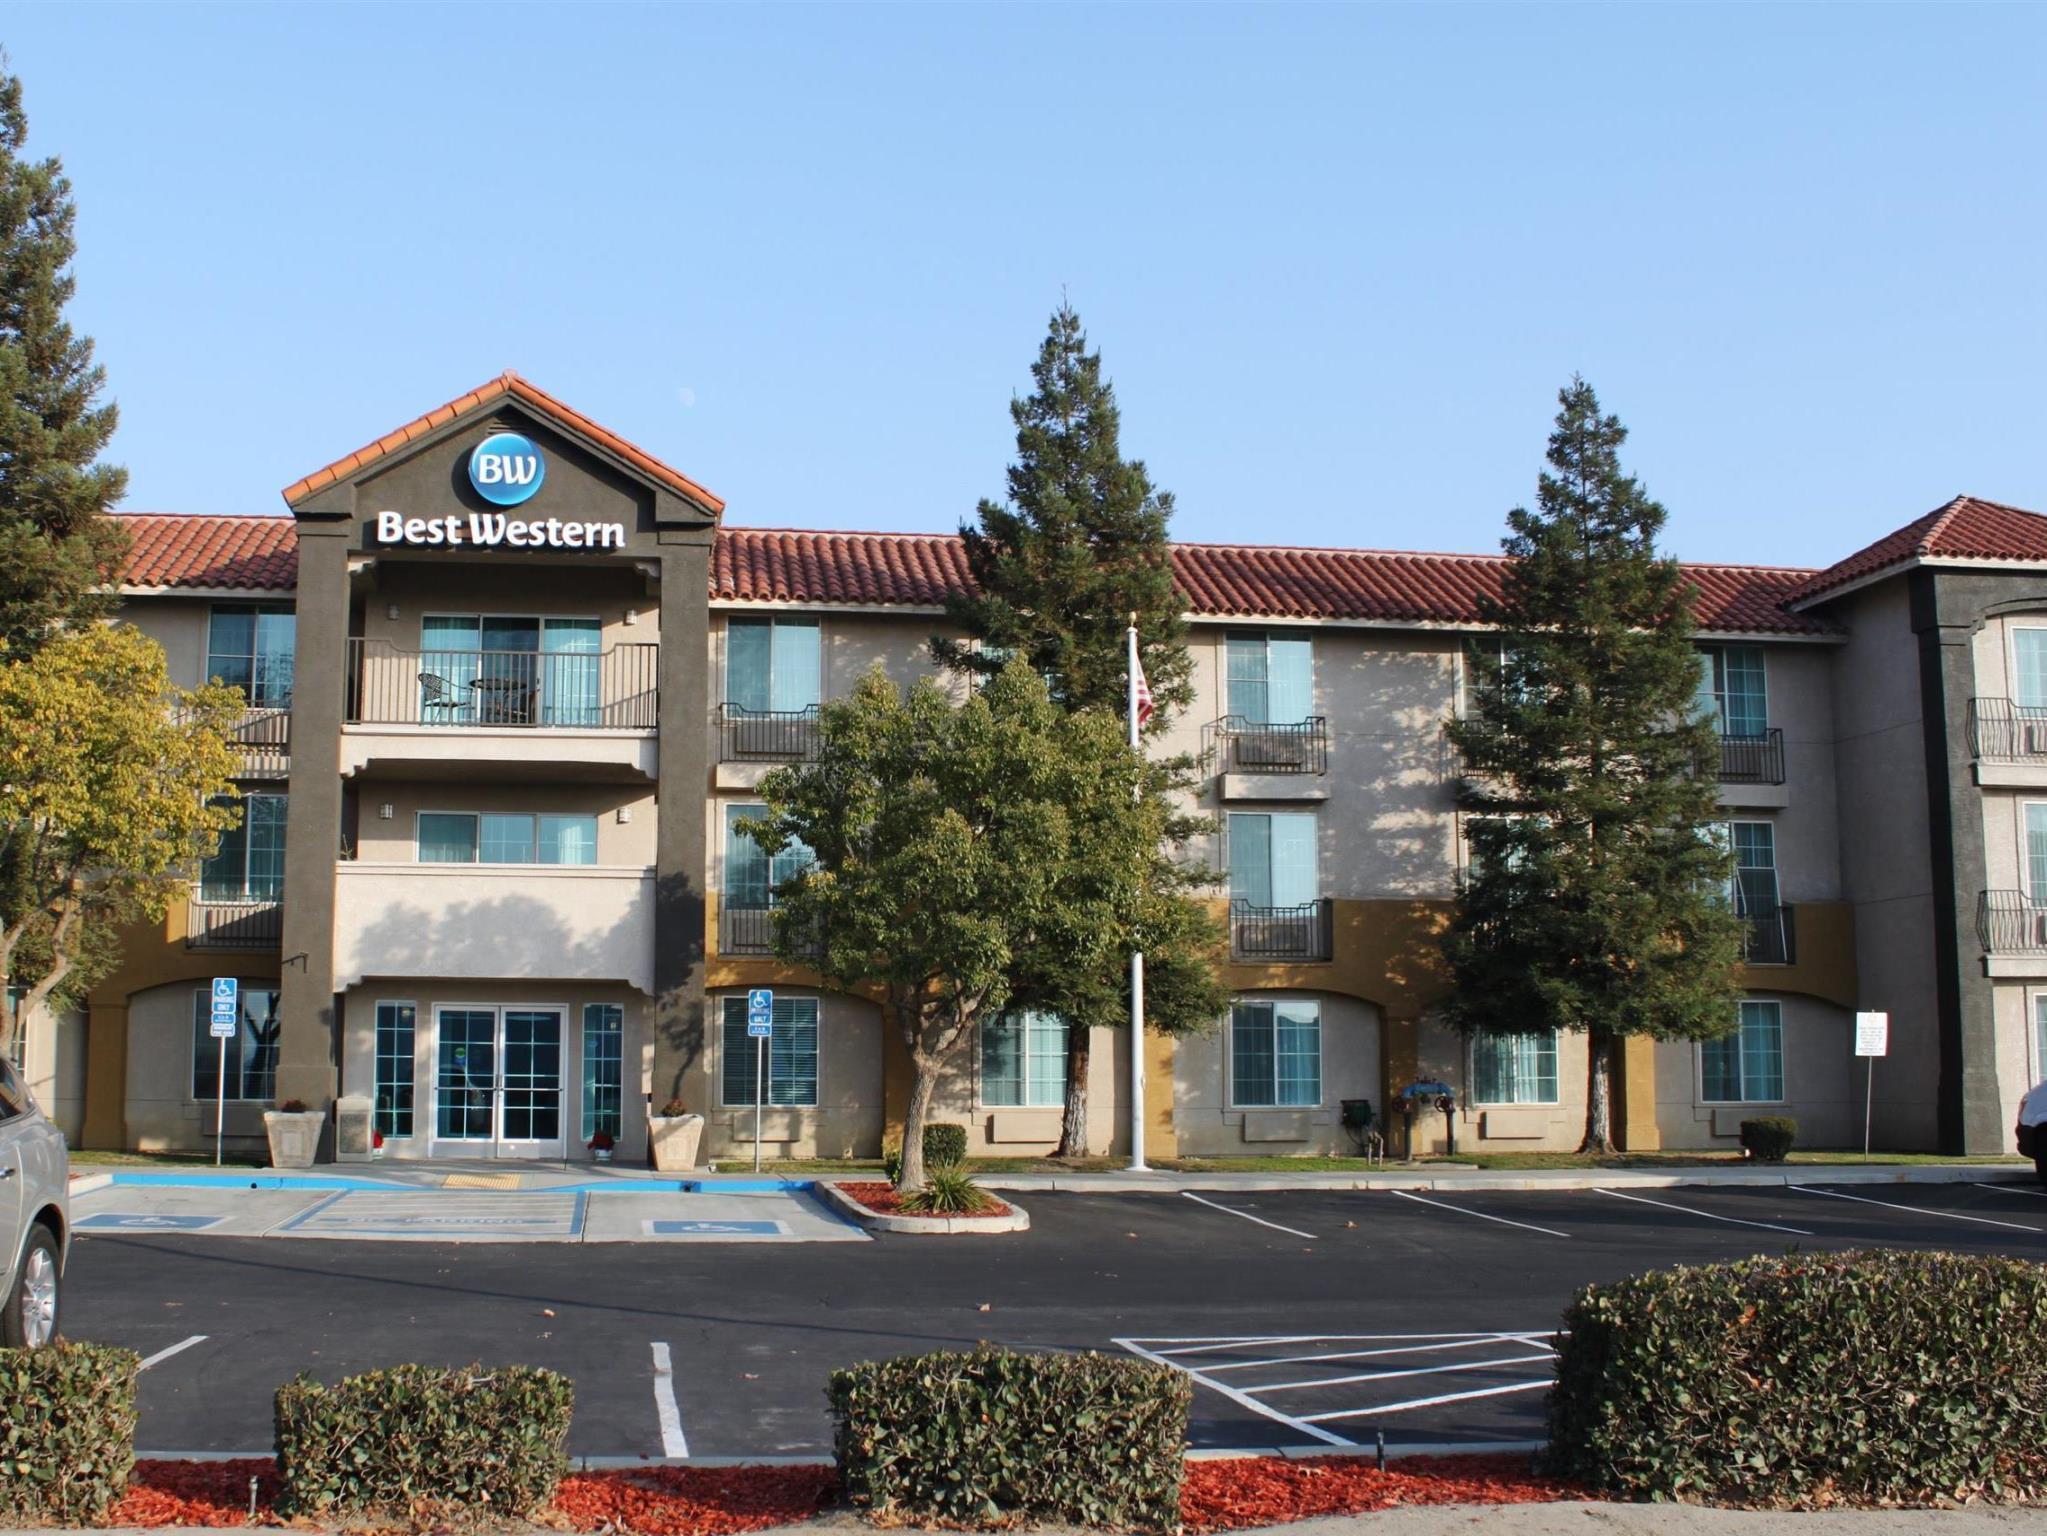 Best Western Visalia Hotel